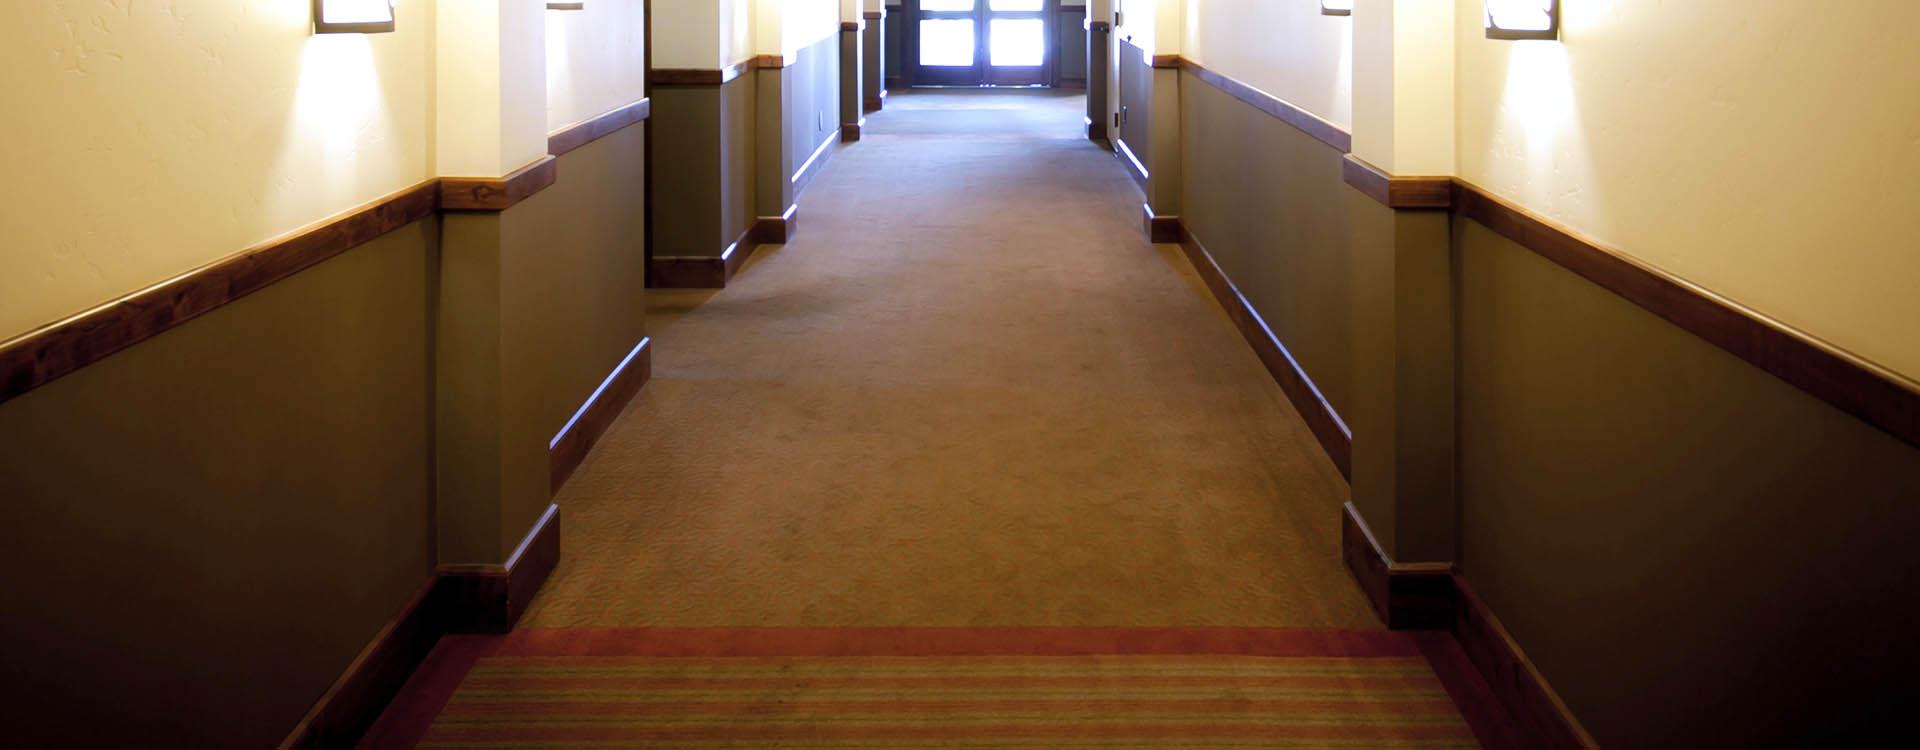 Carpet Cleaning Huntsville Ar Carpet Vidalondon